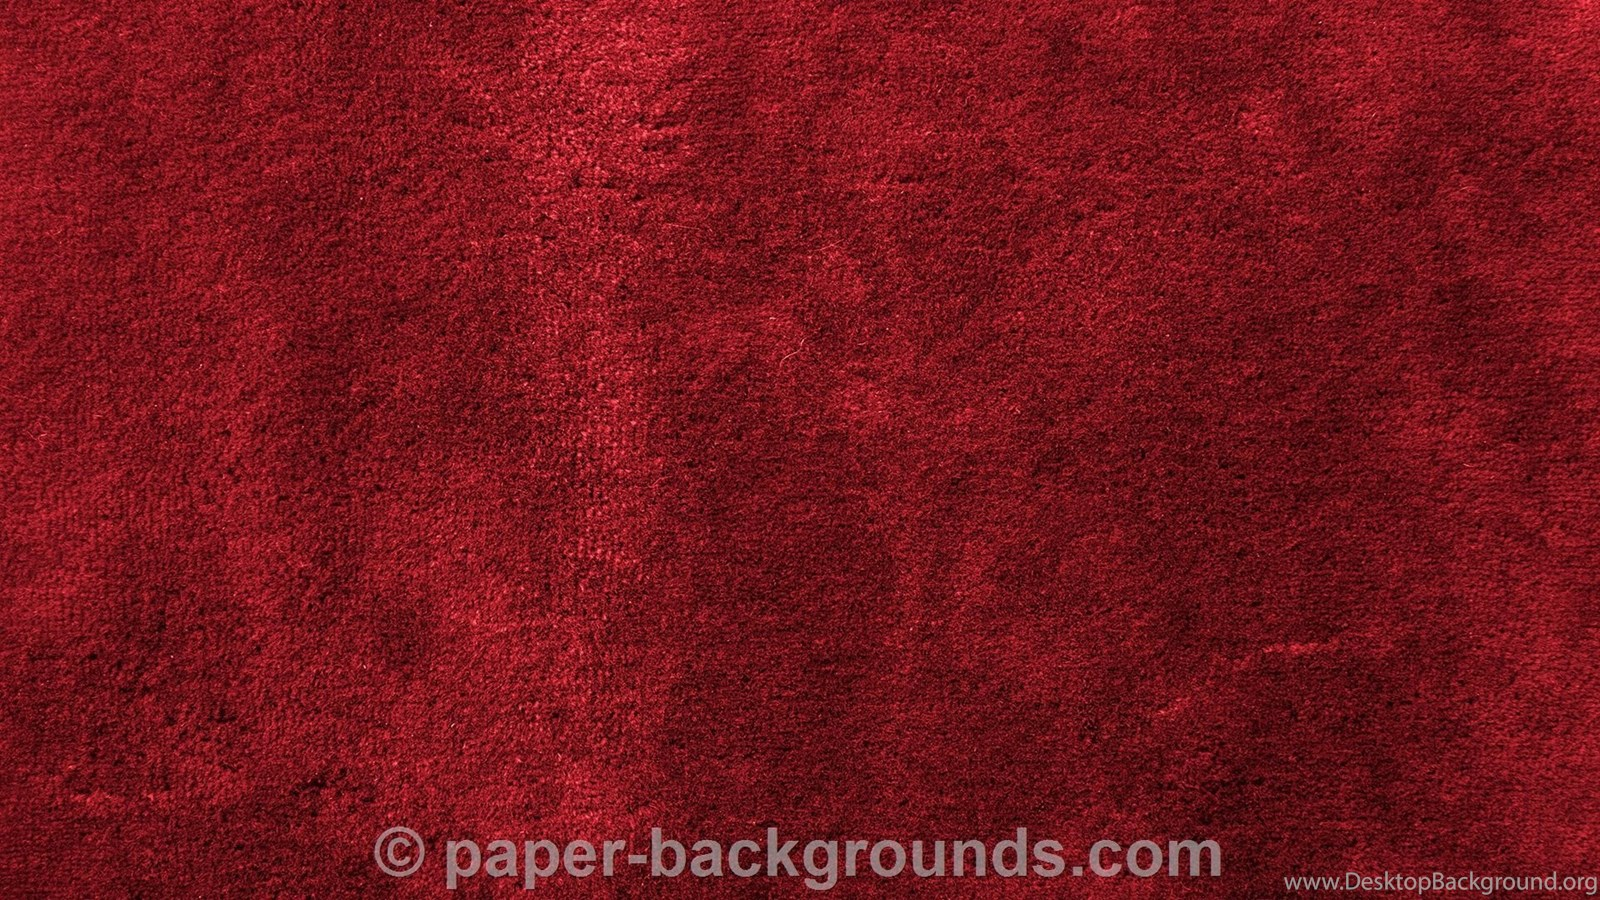 Red Velvet Texture Backgrounds Hd Paper Backgrounds Desktop